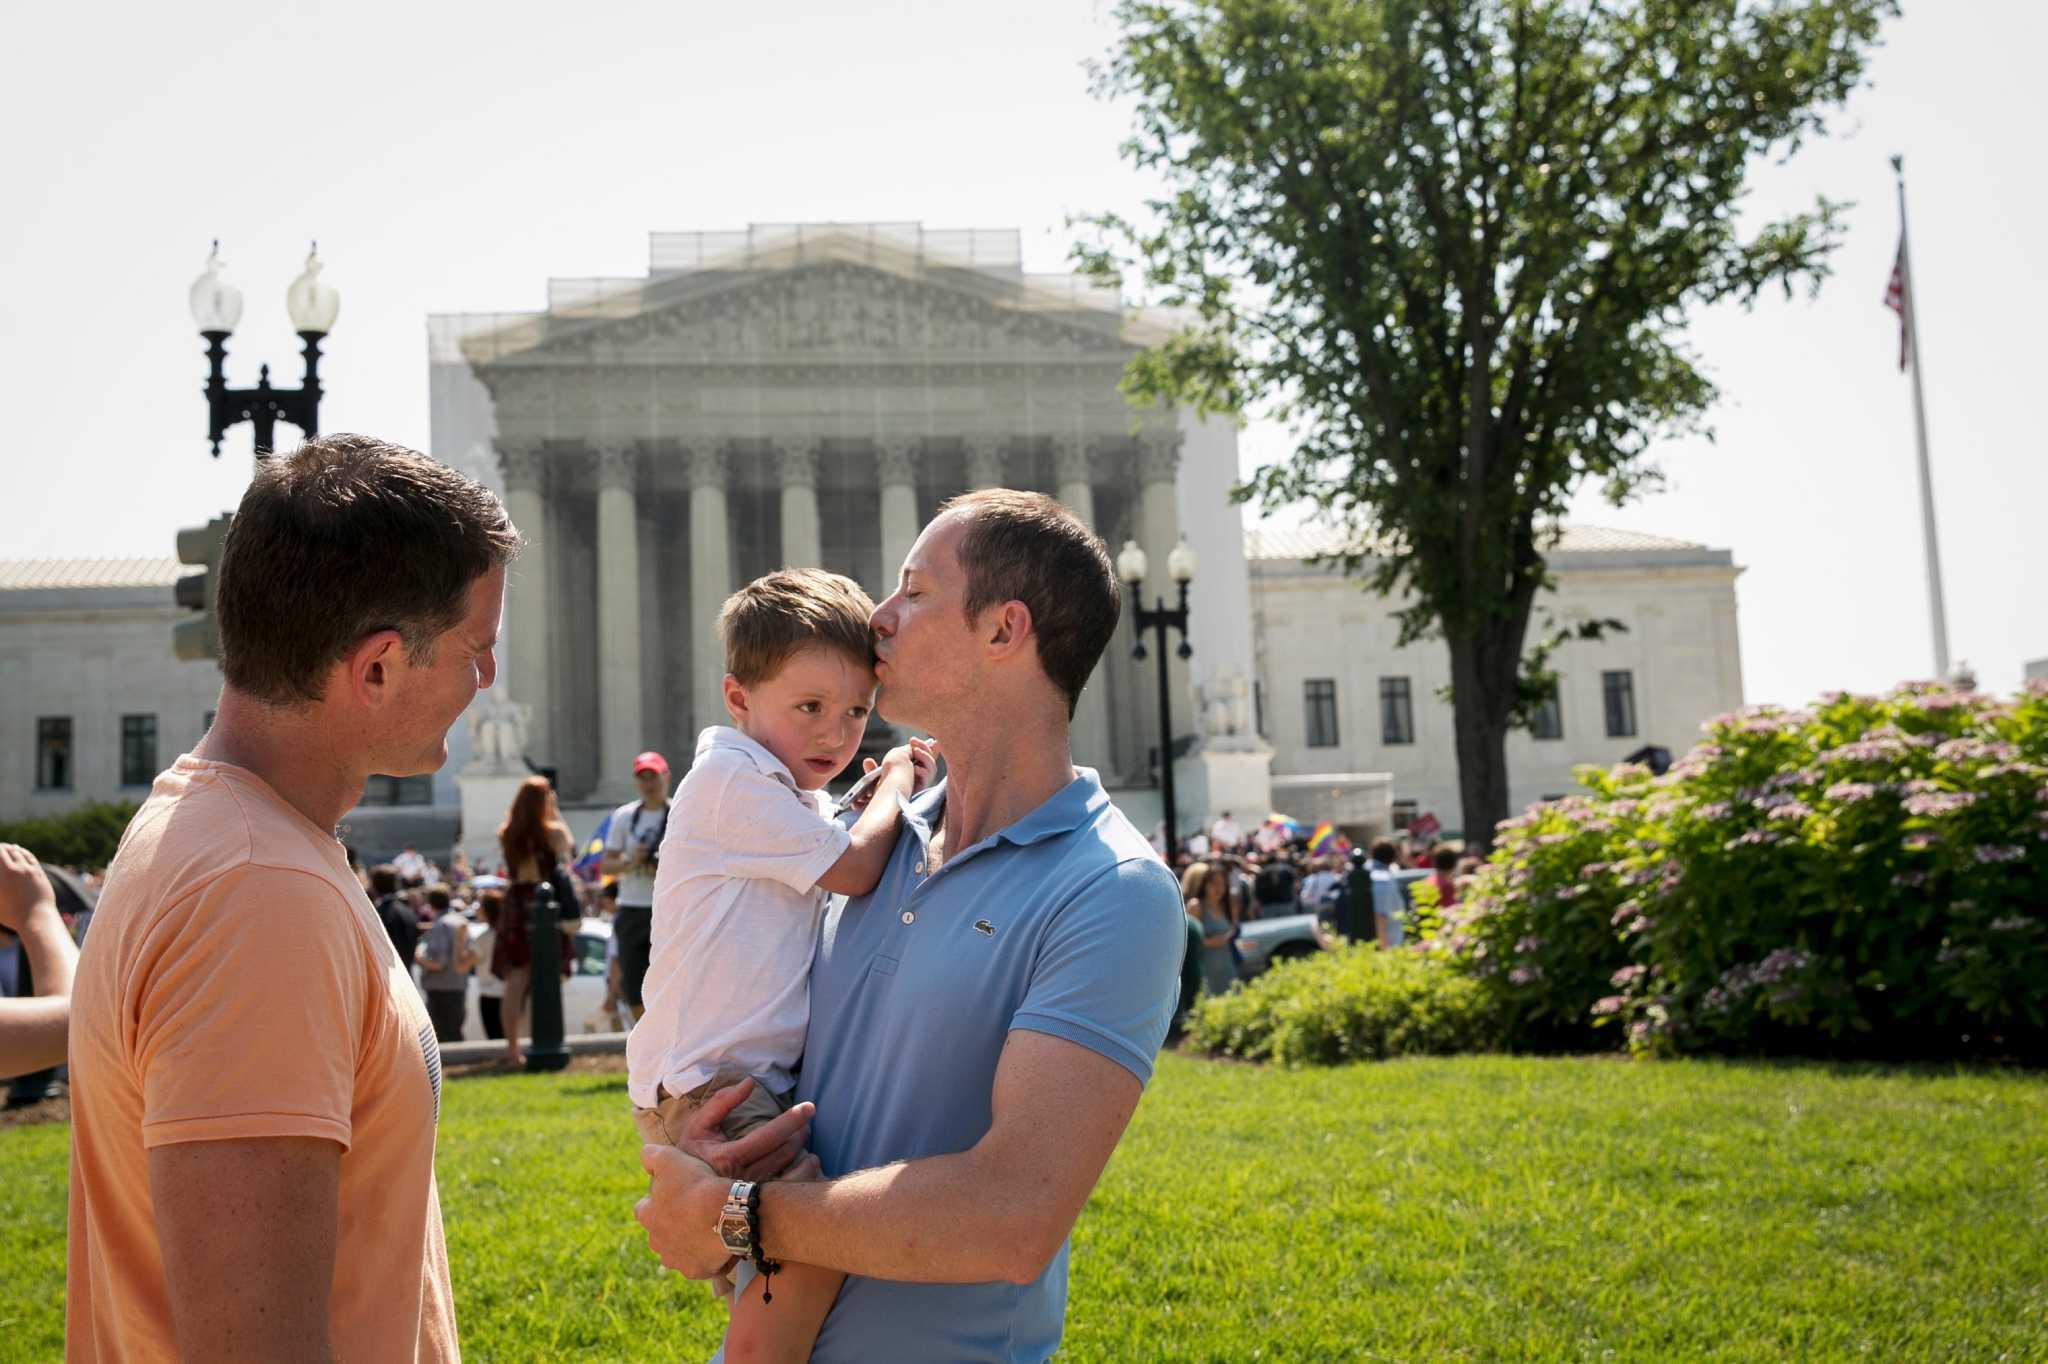 Supreme court to decide historic same